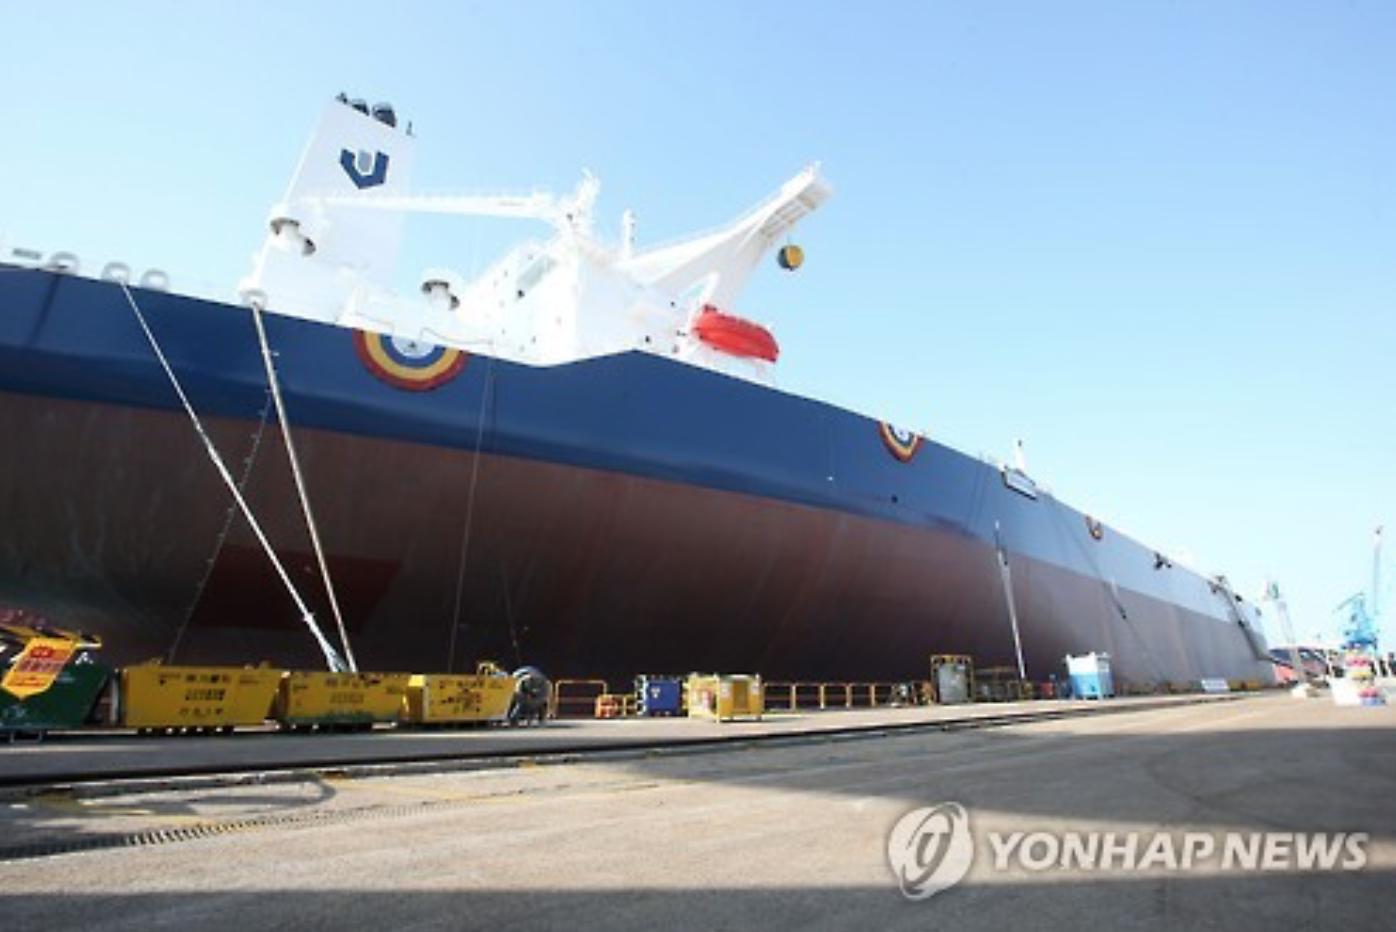 Hyundai Samho Delivers Crude Carrier to Saudi Company | Be